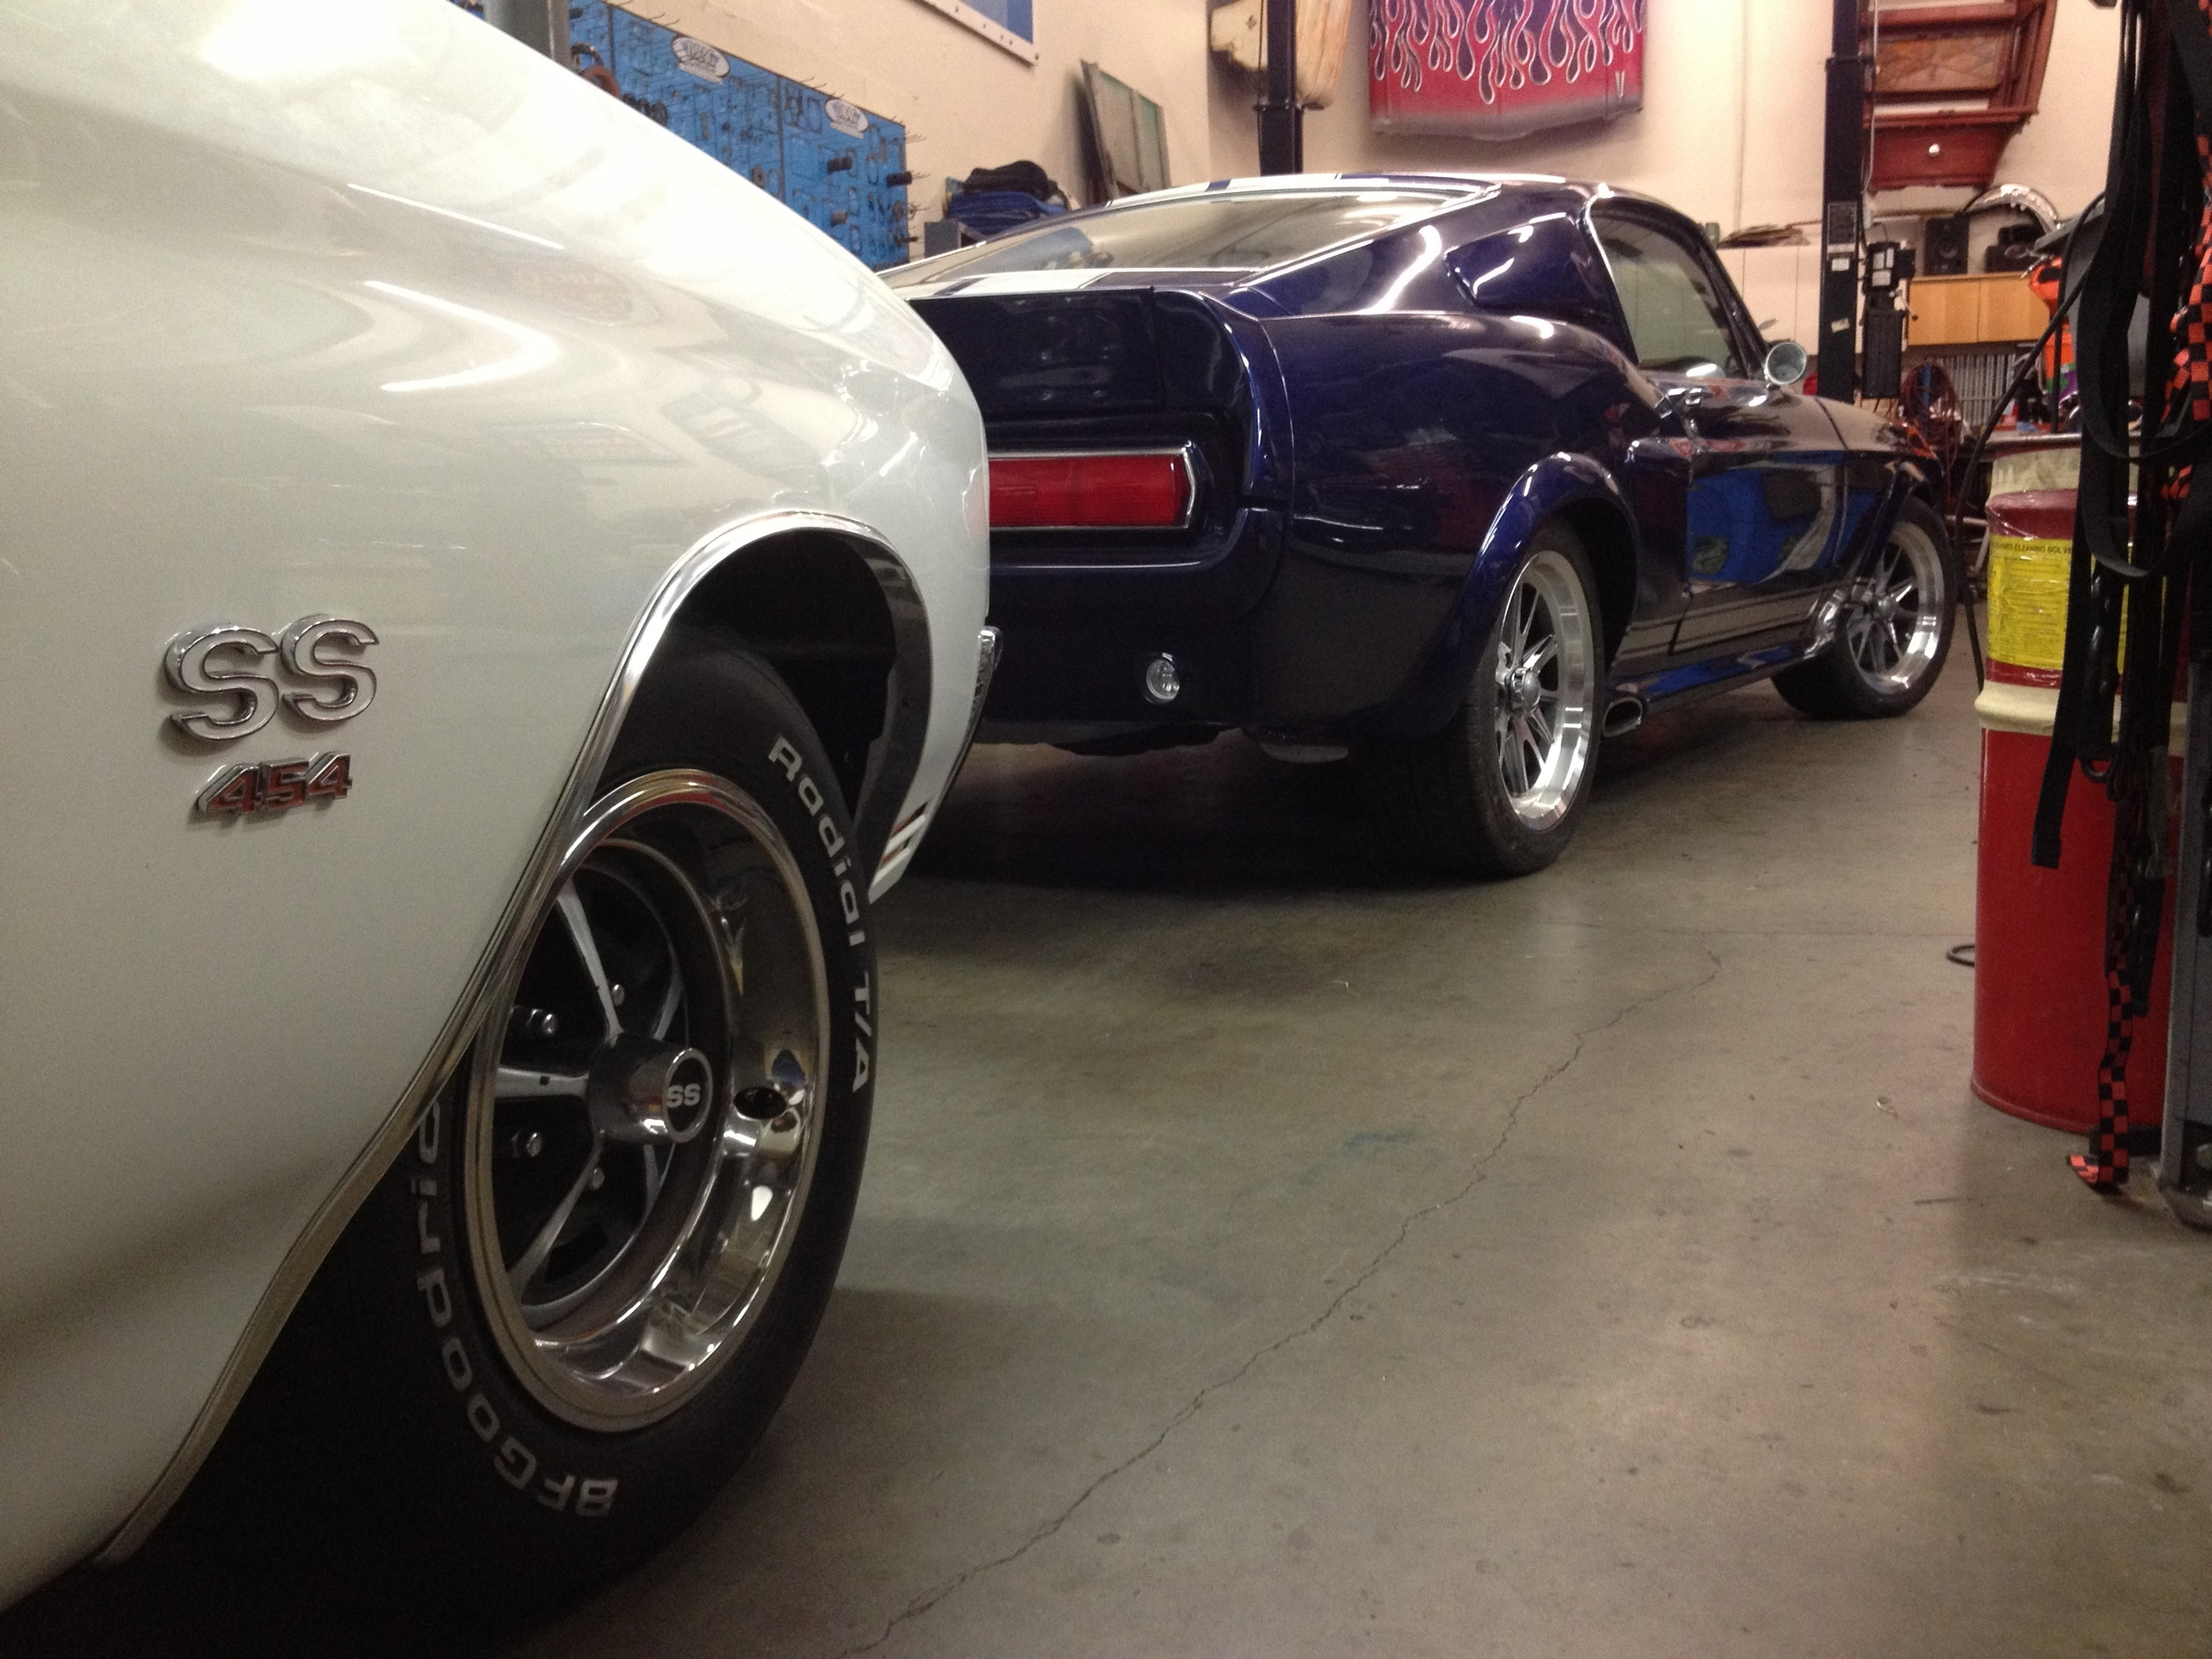 1968 Mustang Fastback Eleanor Tribute